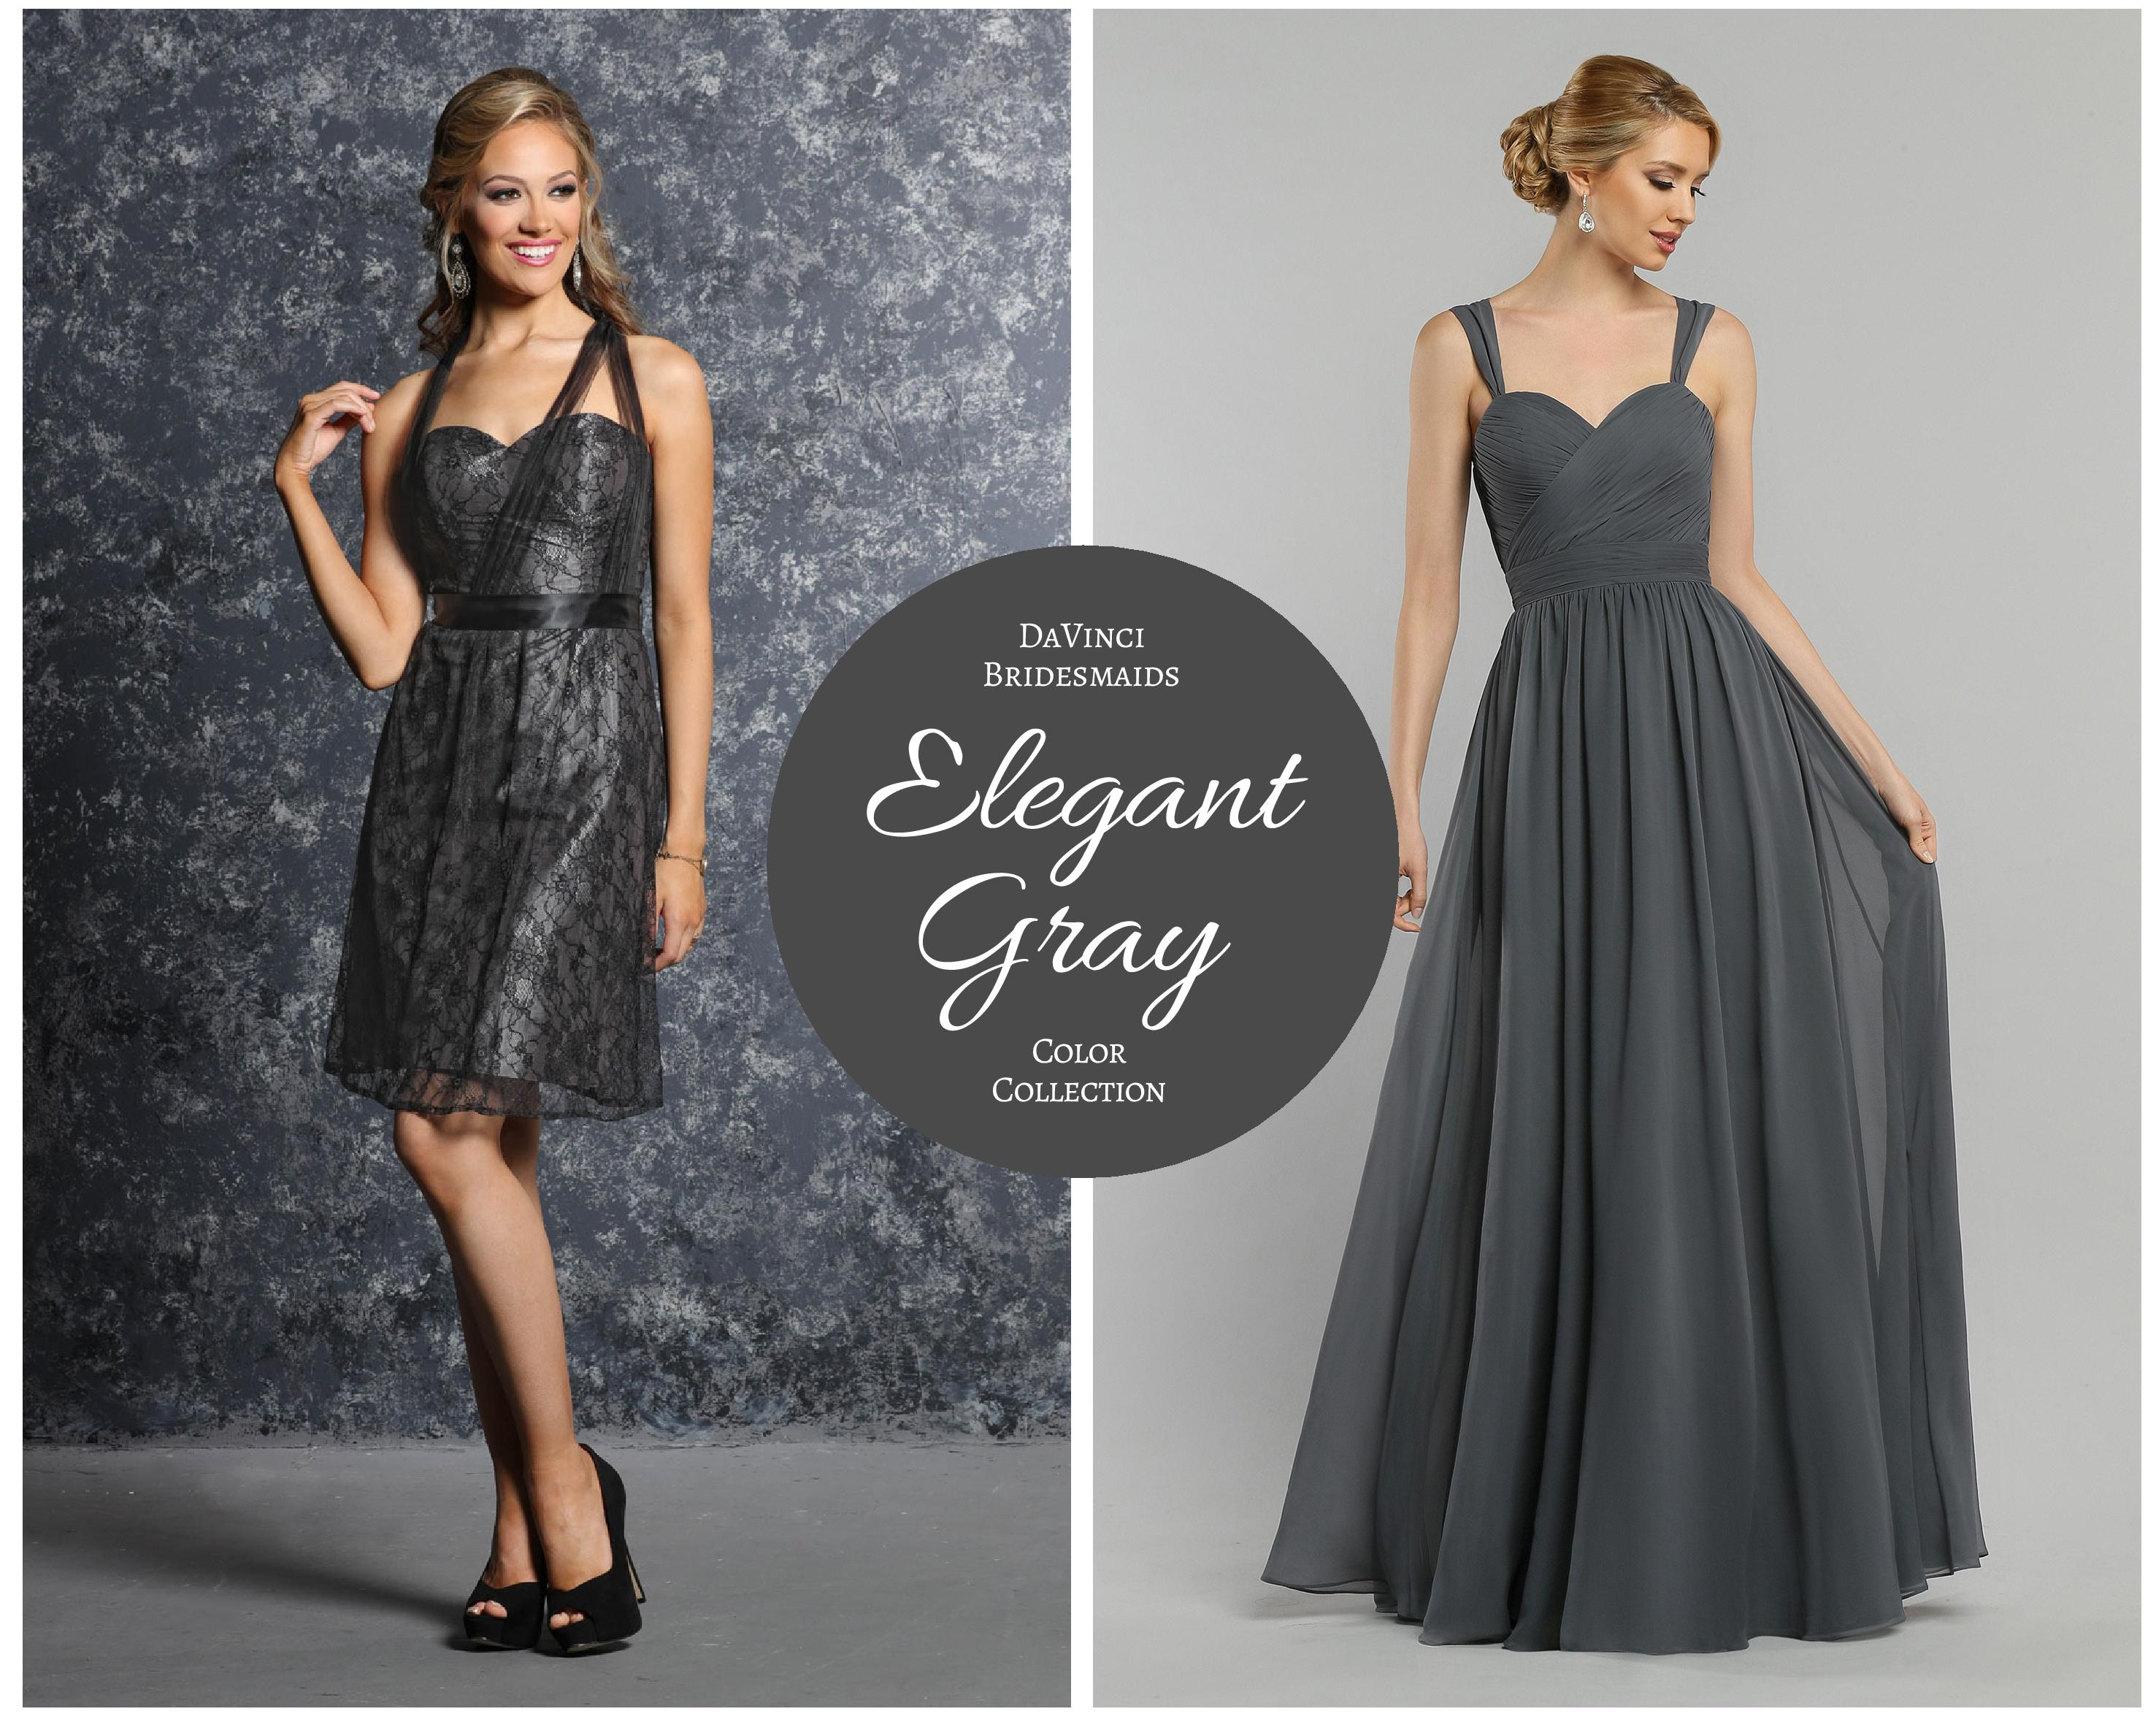 Elegant Gray Bridesmaids Gowns - DaVinci Bridal Blog